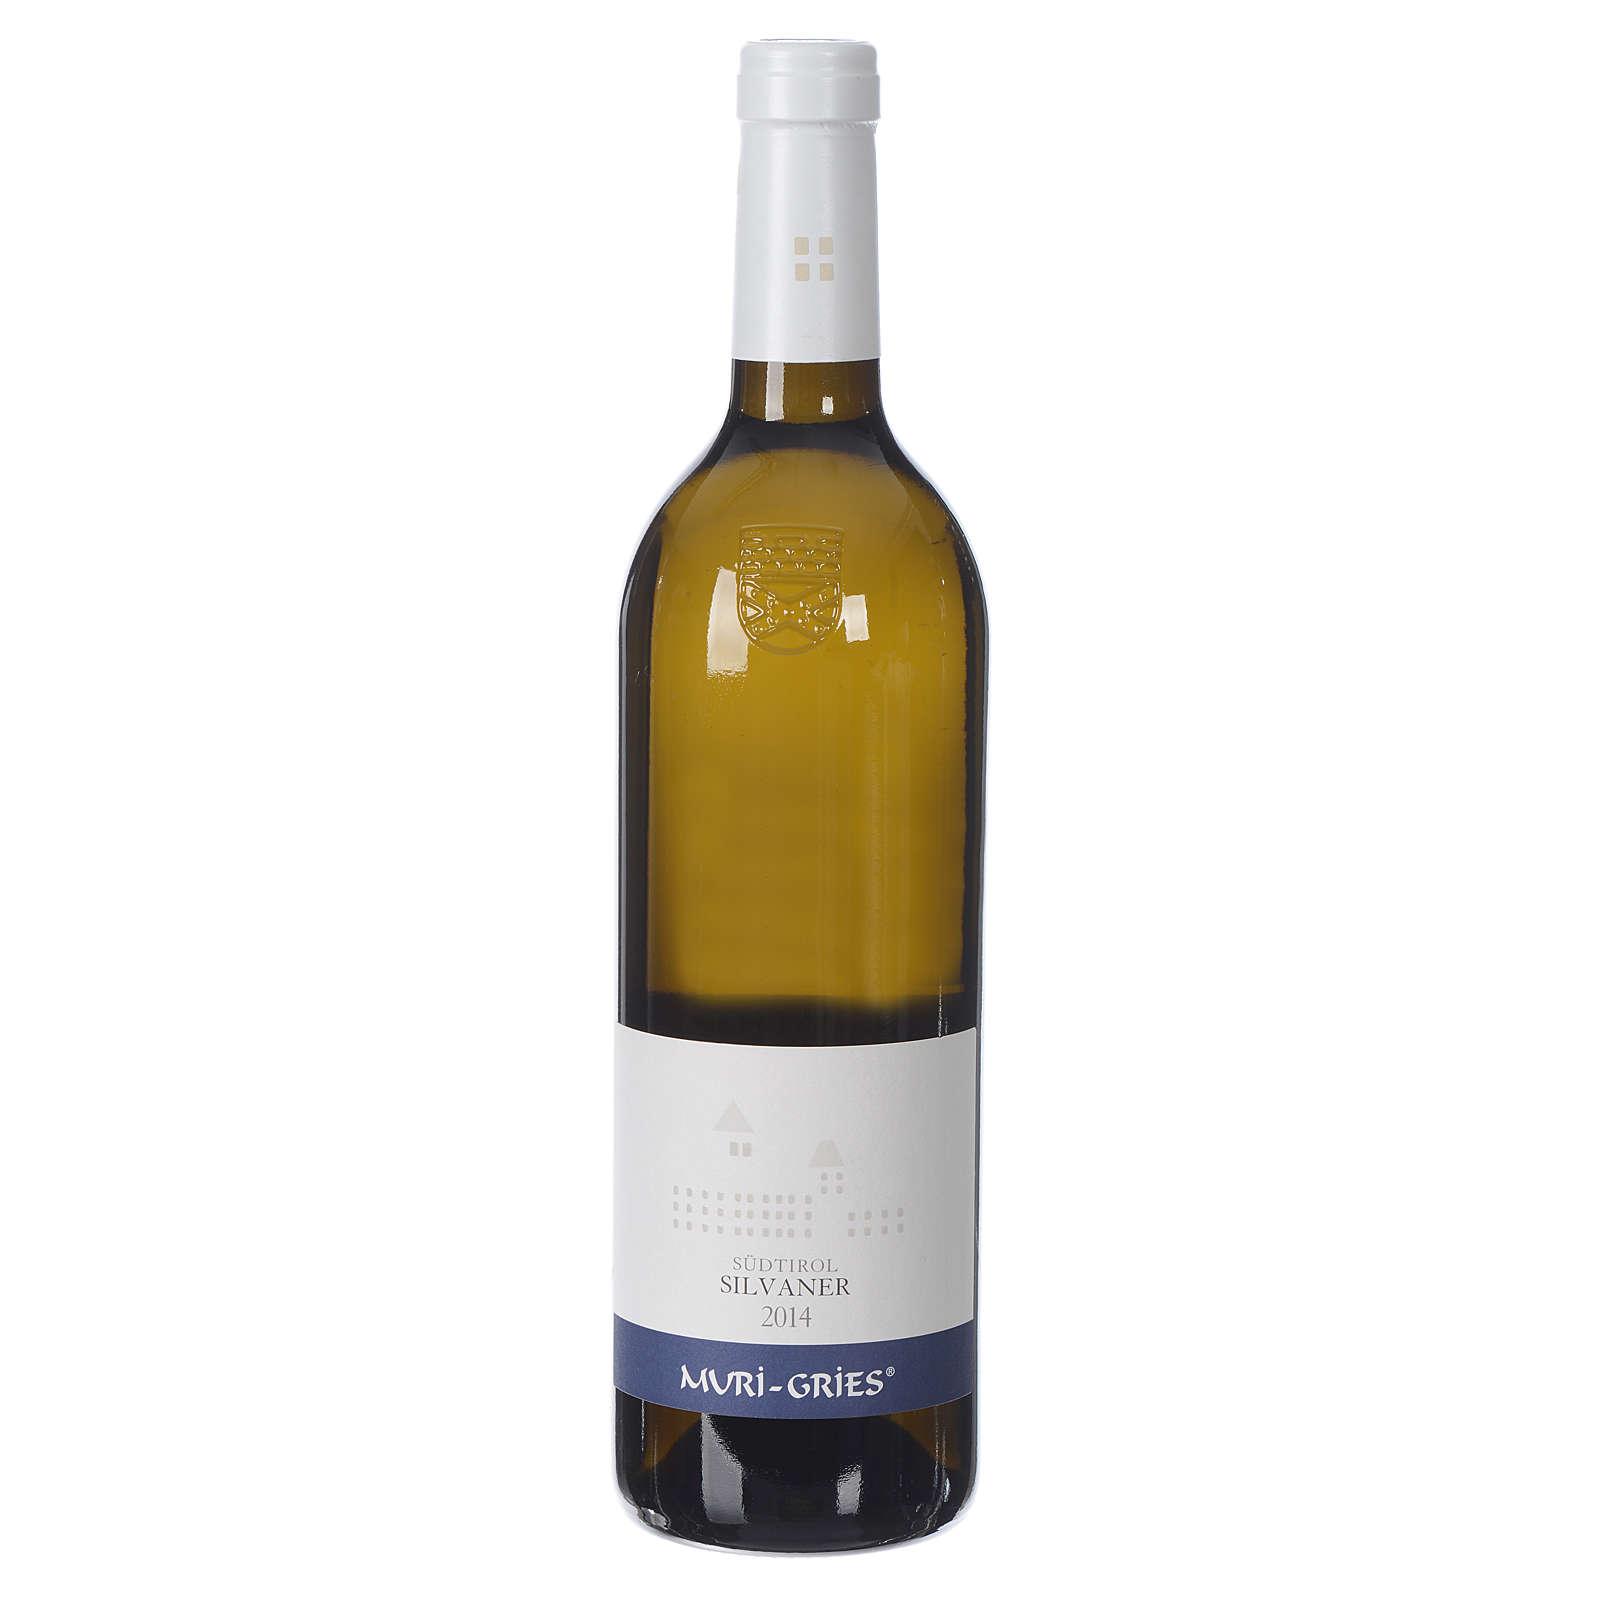 Vino Silvaner DOC 2015 Abadía Muri Gries 750 ml 3